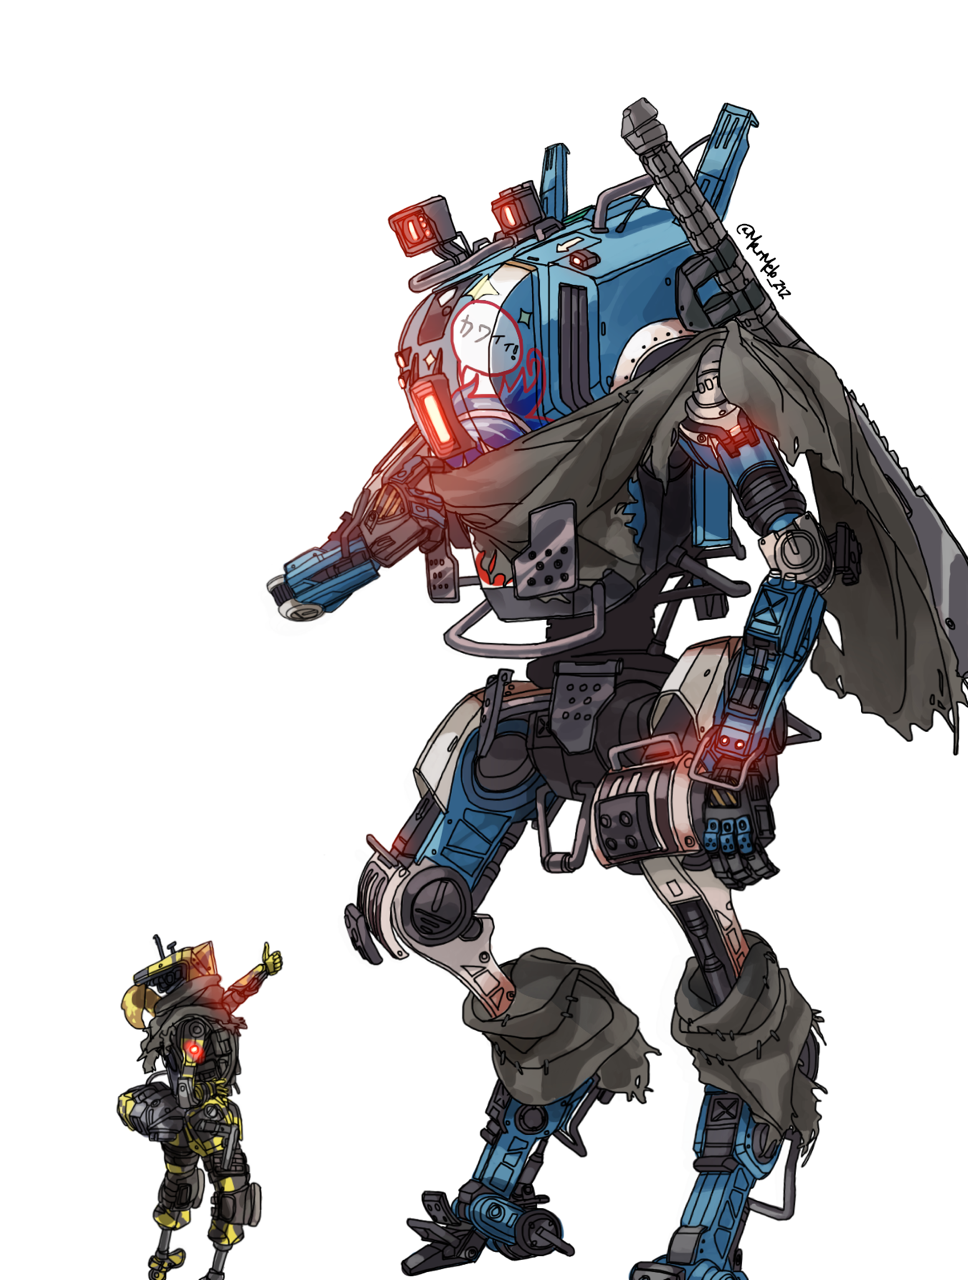 Titanfall 2 Robots Ronin By Marmeleiro212 Titanfall Robot Concept Art Robots Concept